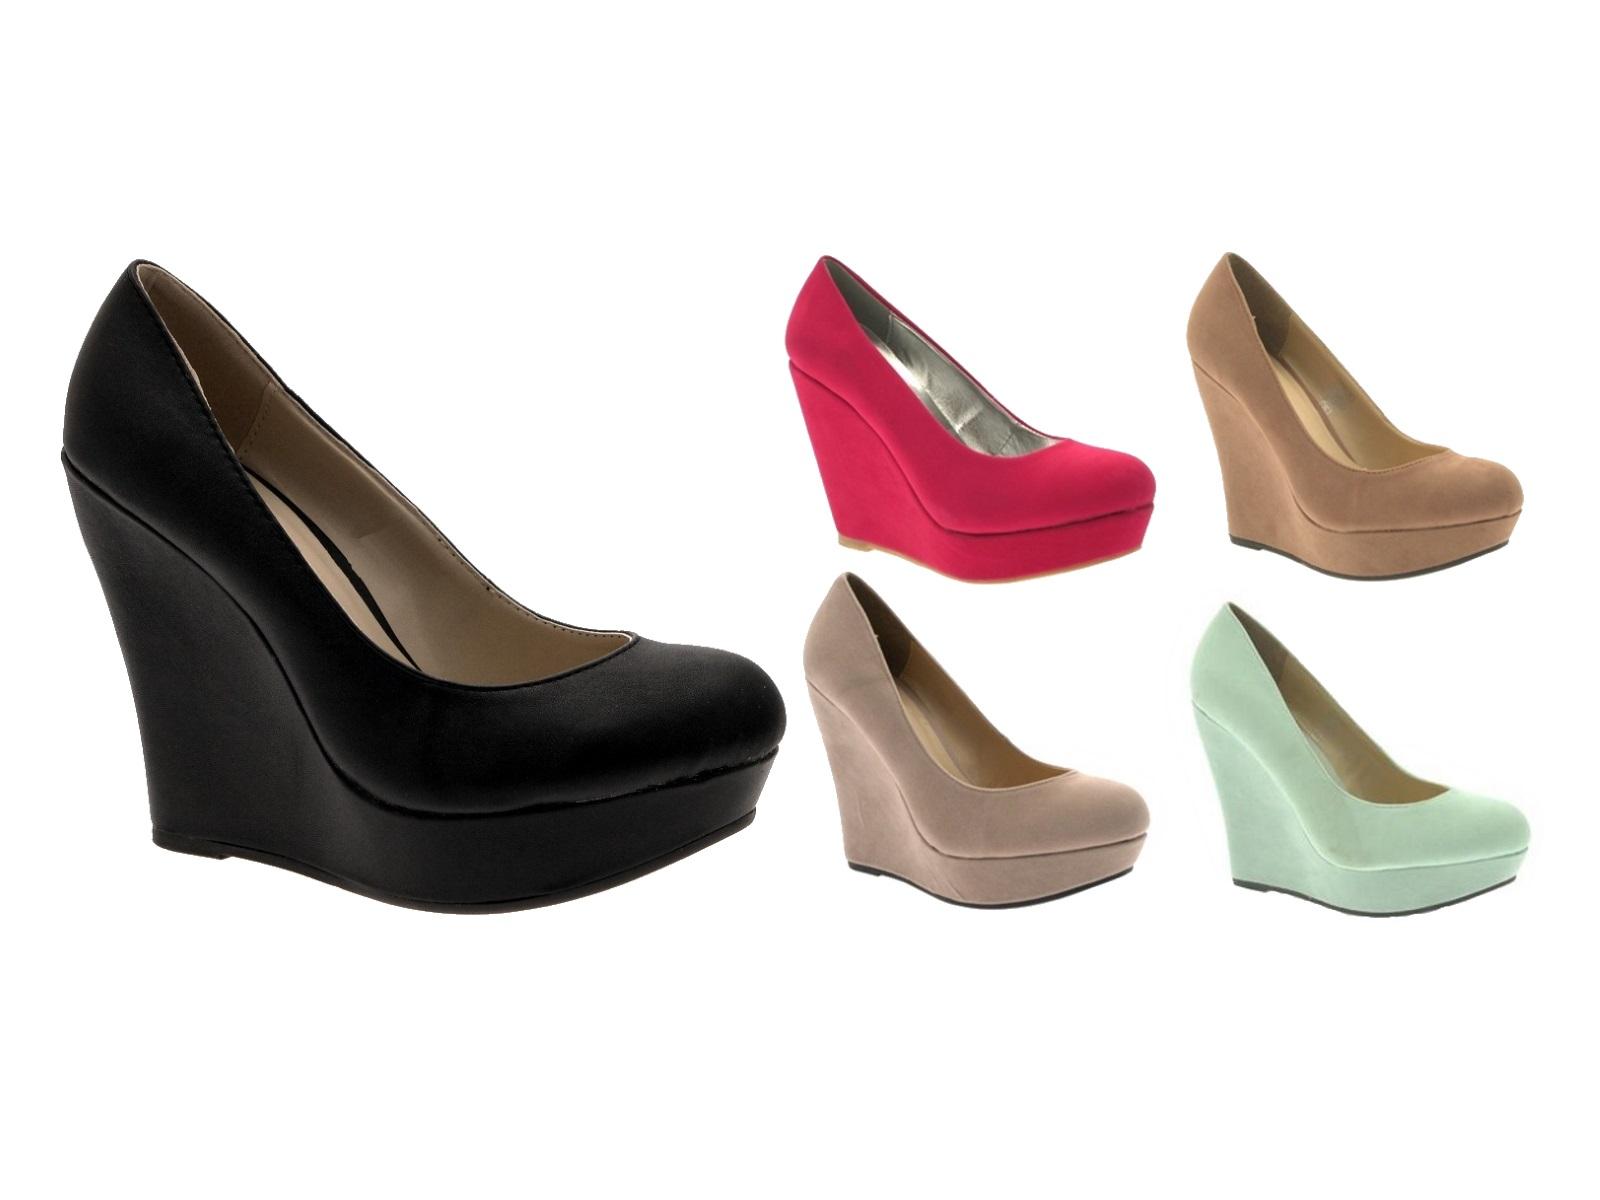 44cc308edb0 Womens Wedge Platforms High Heels Full Toe Court Shoes Ladies Girls Size UK  3-8